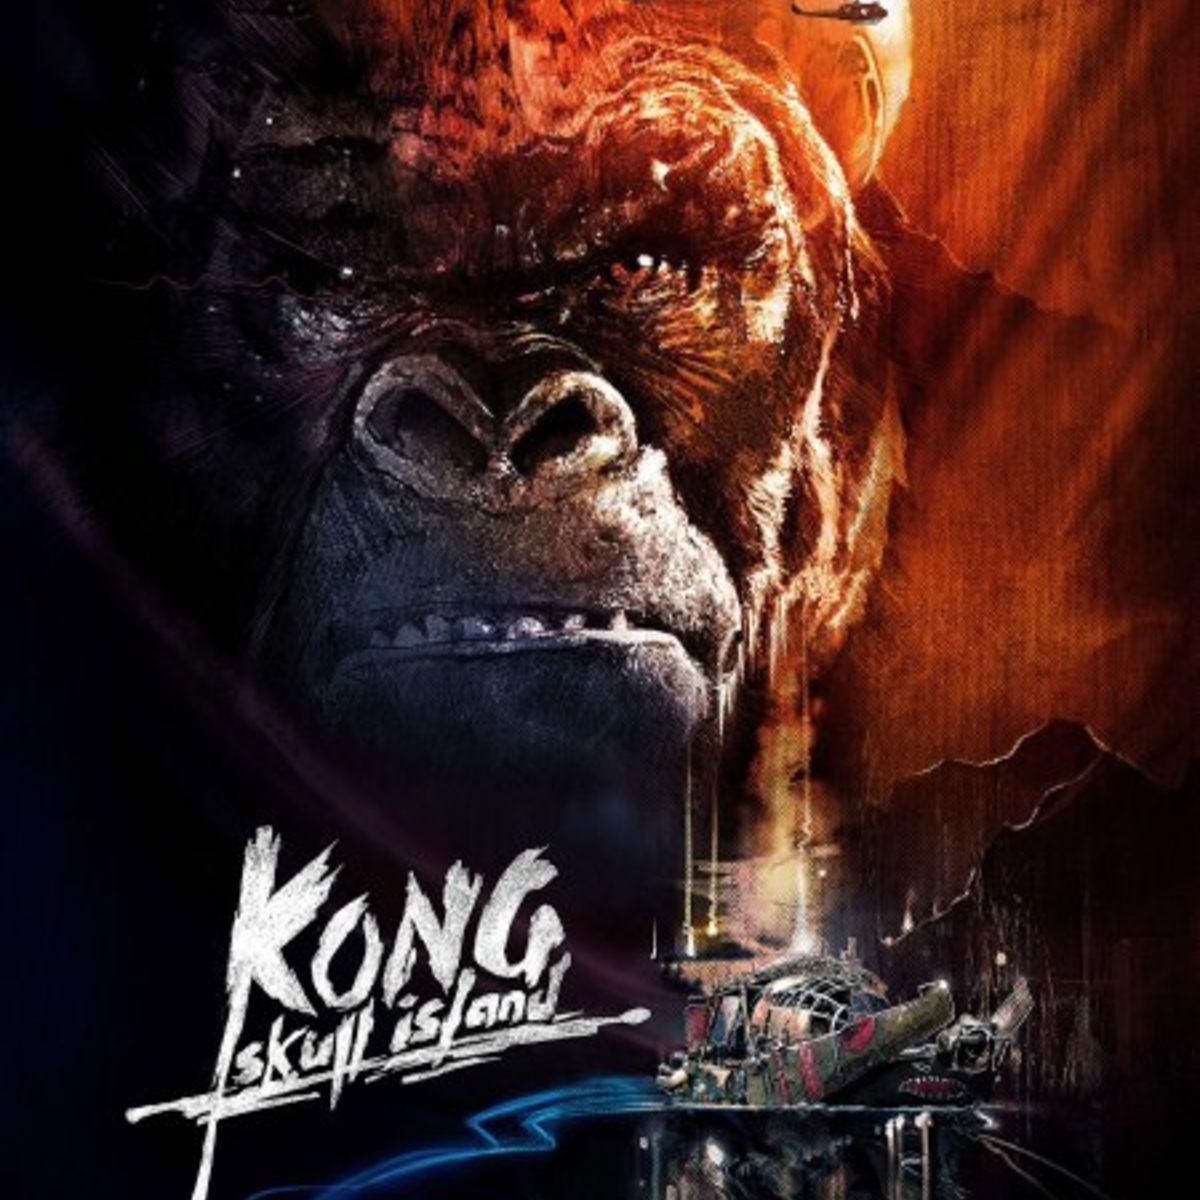 Kong-Skull-Island-IMAX-poster_0.jpg